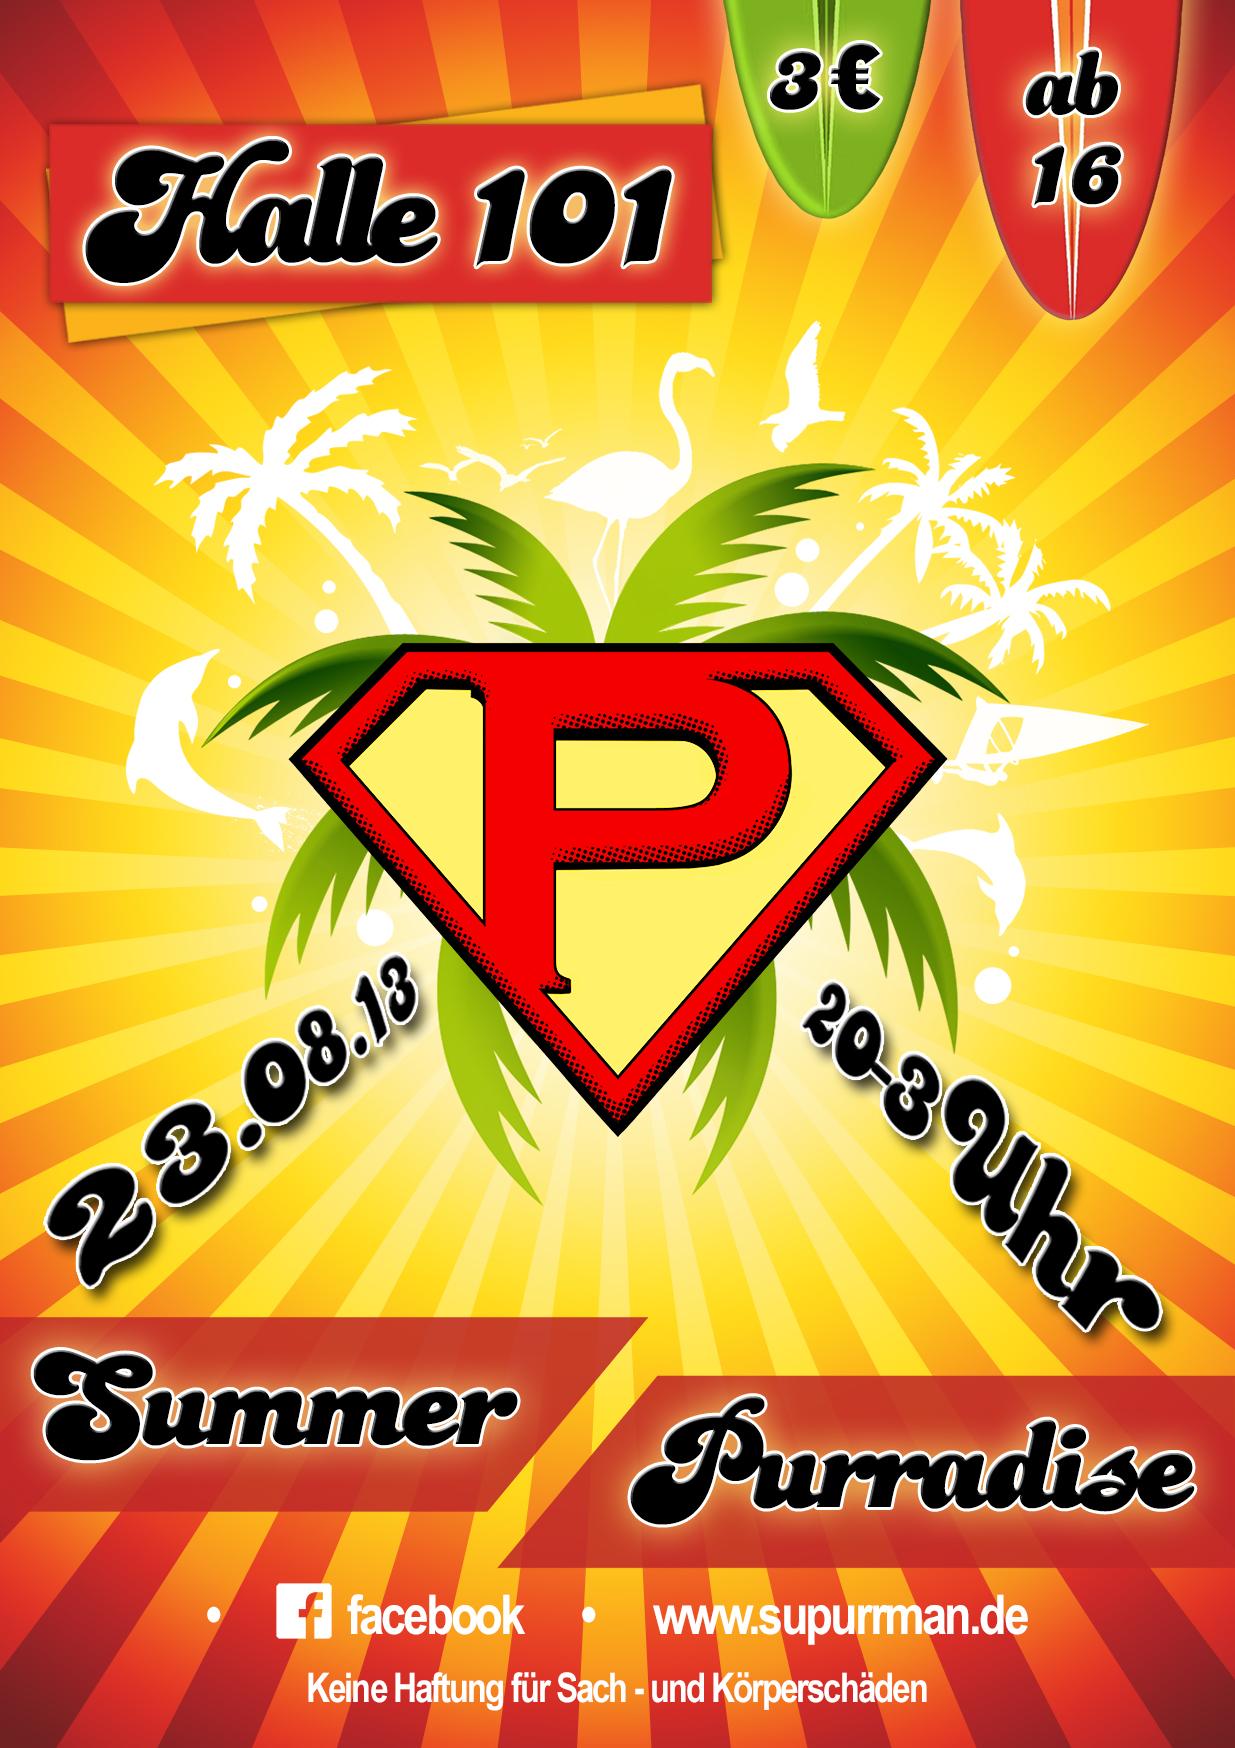 Supurrman - Summerpurradise